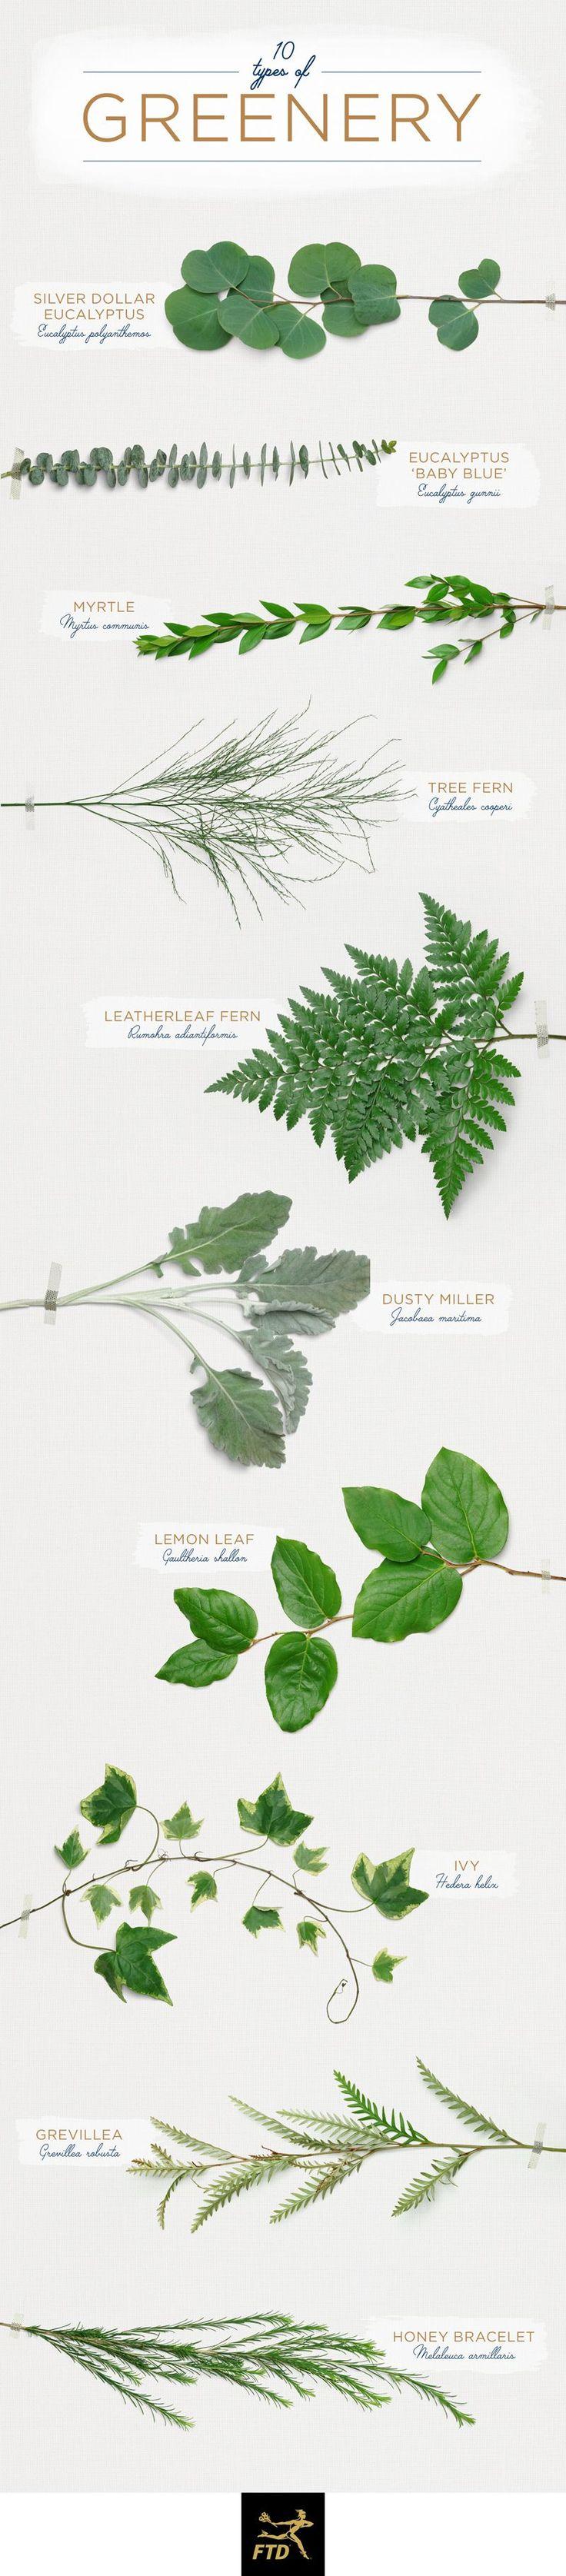 2018 Wedding Trends Greenery. Green wedding Flowers Guide on How to DIY Wedding Flowers. #greenery #weddingtrends #diywedding